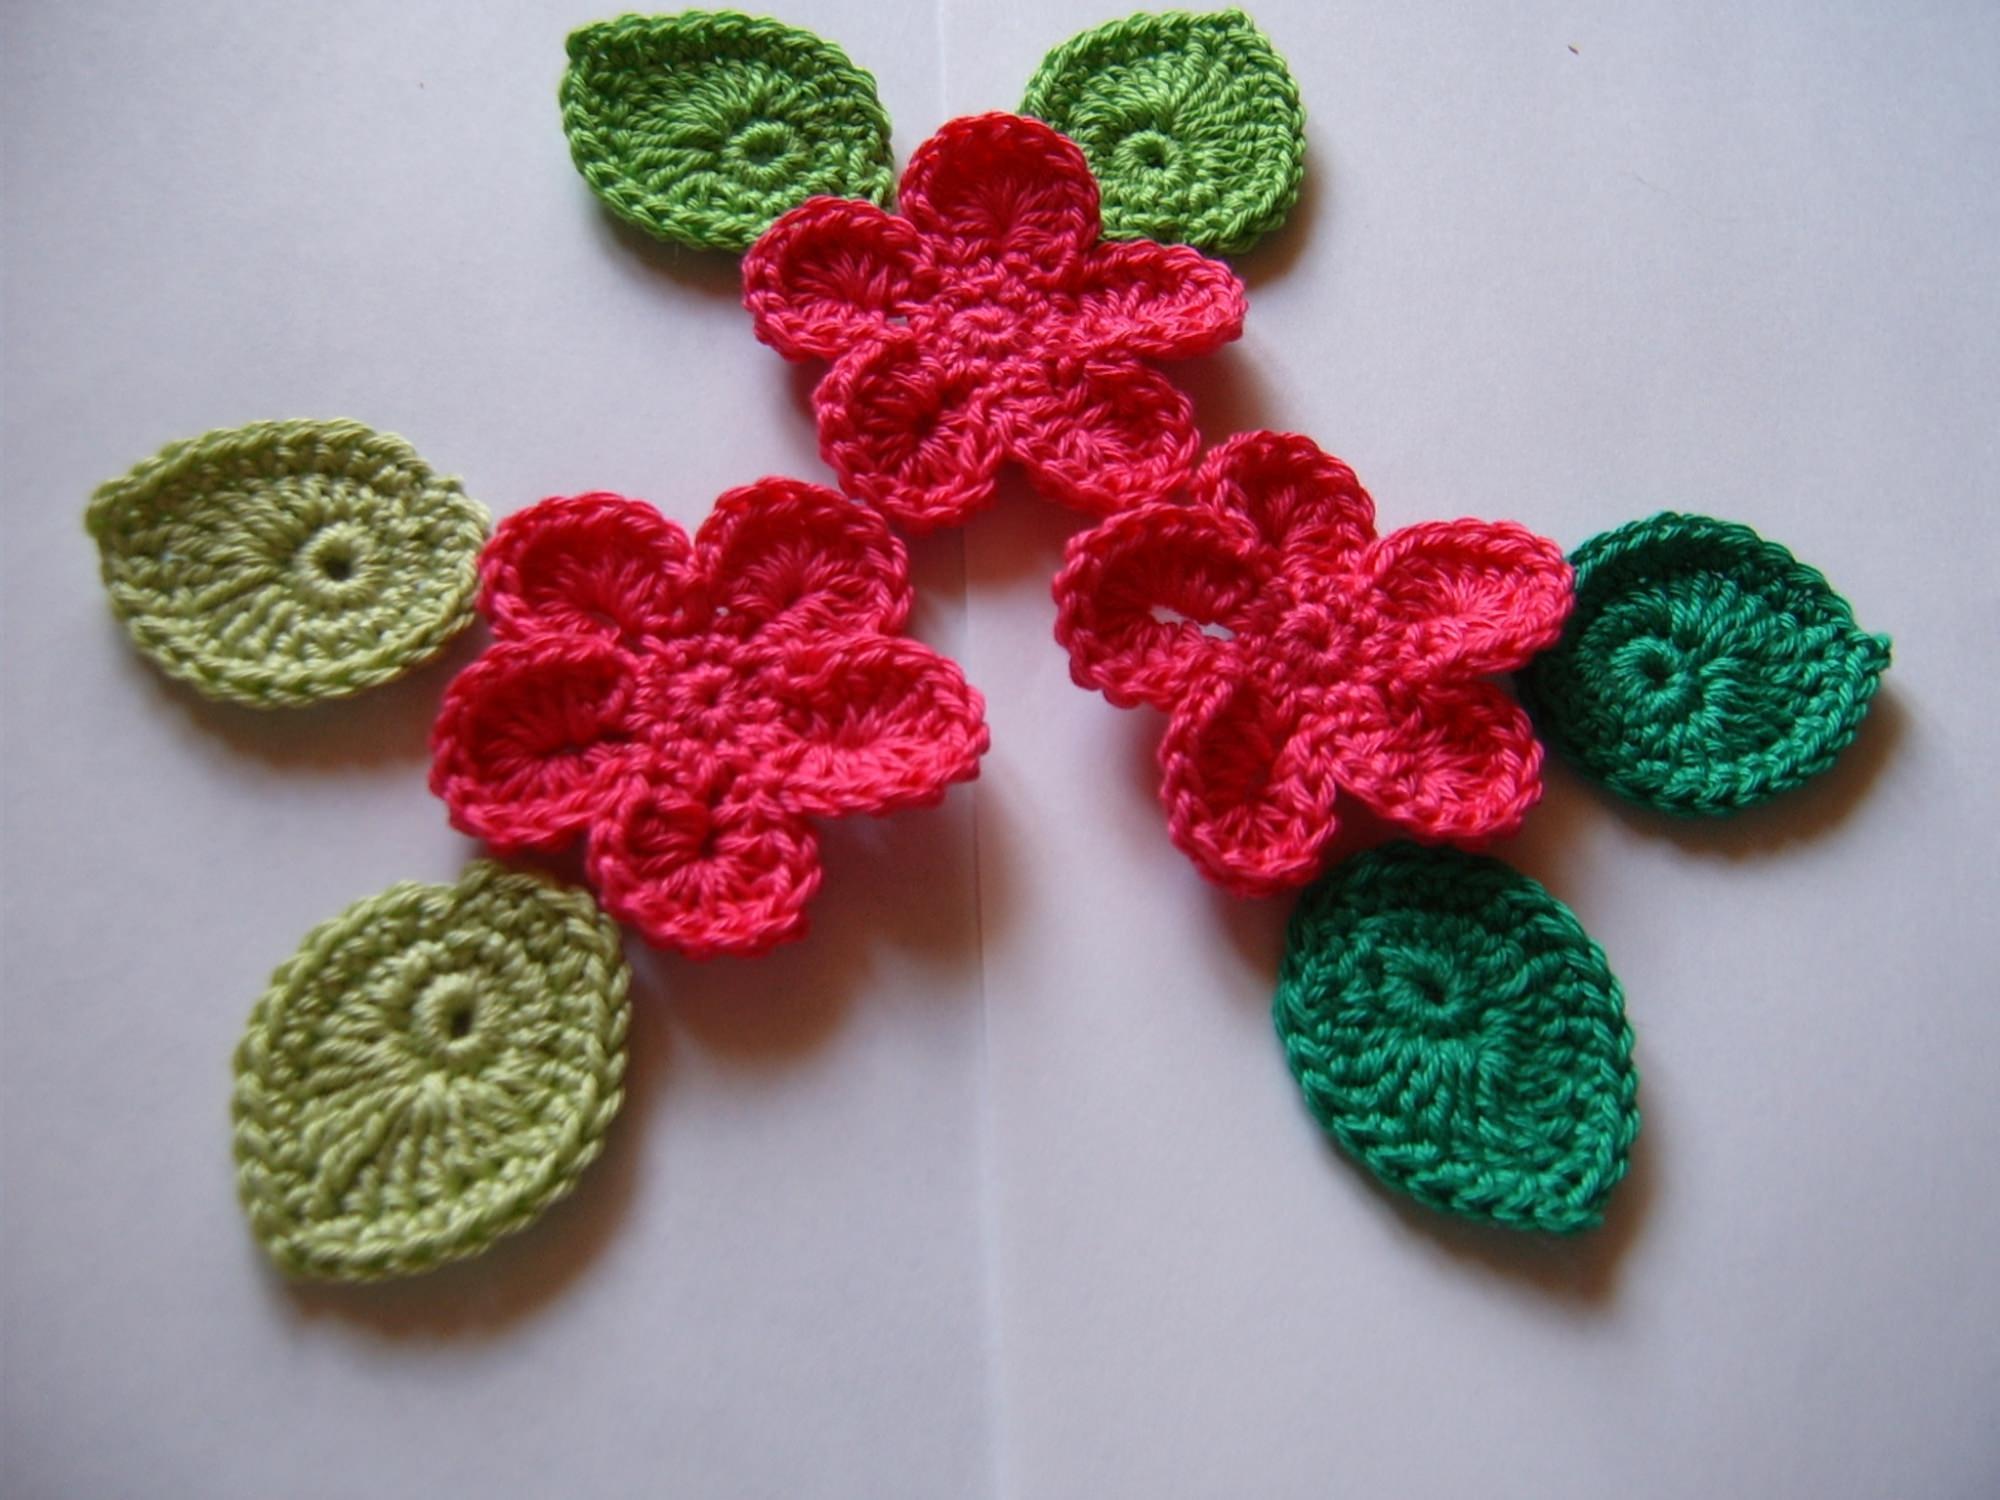 - Häkelblüten und Blätter - Häkelblüten und Blätter